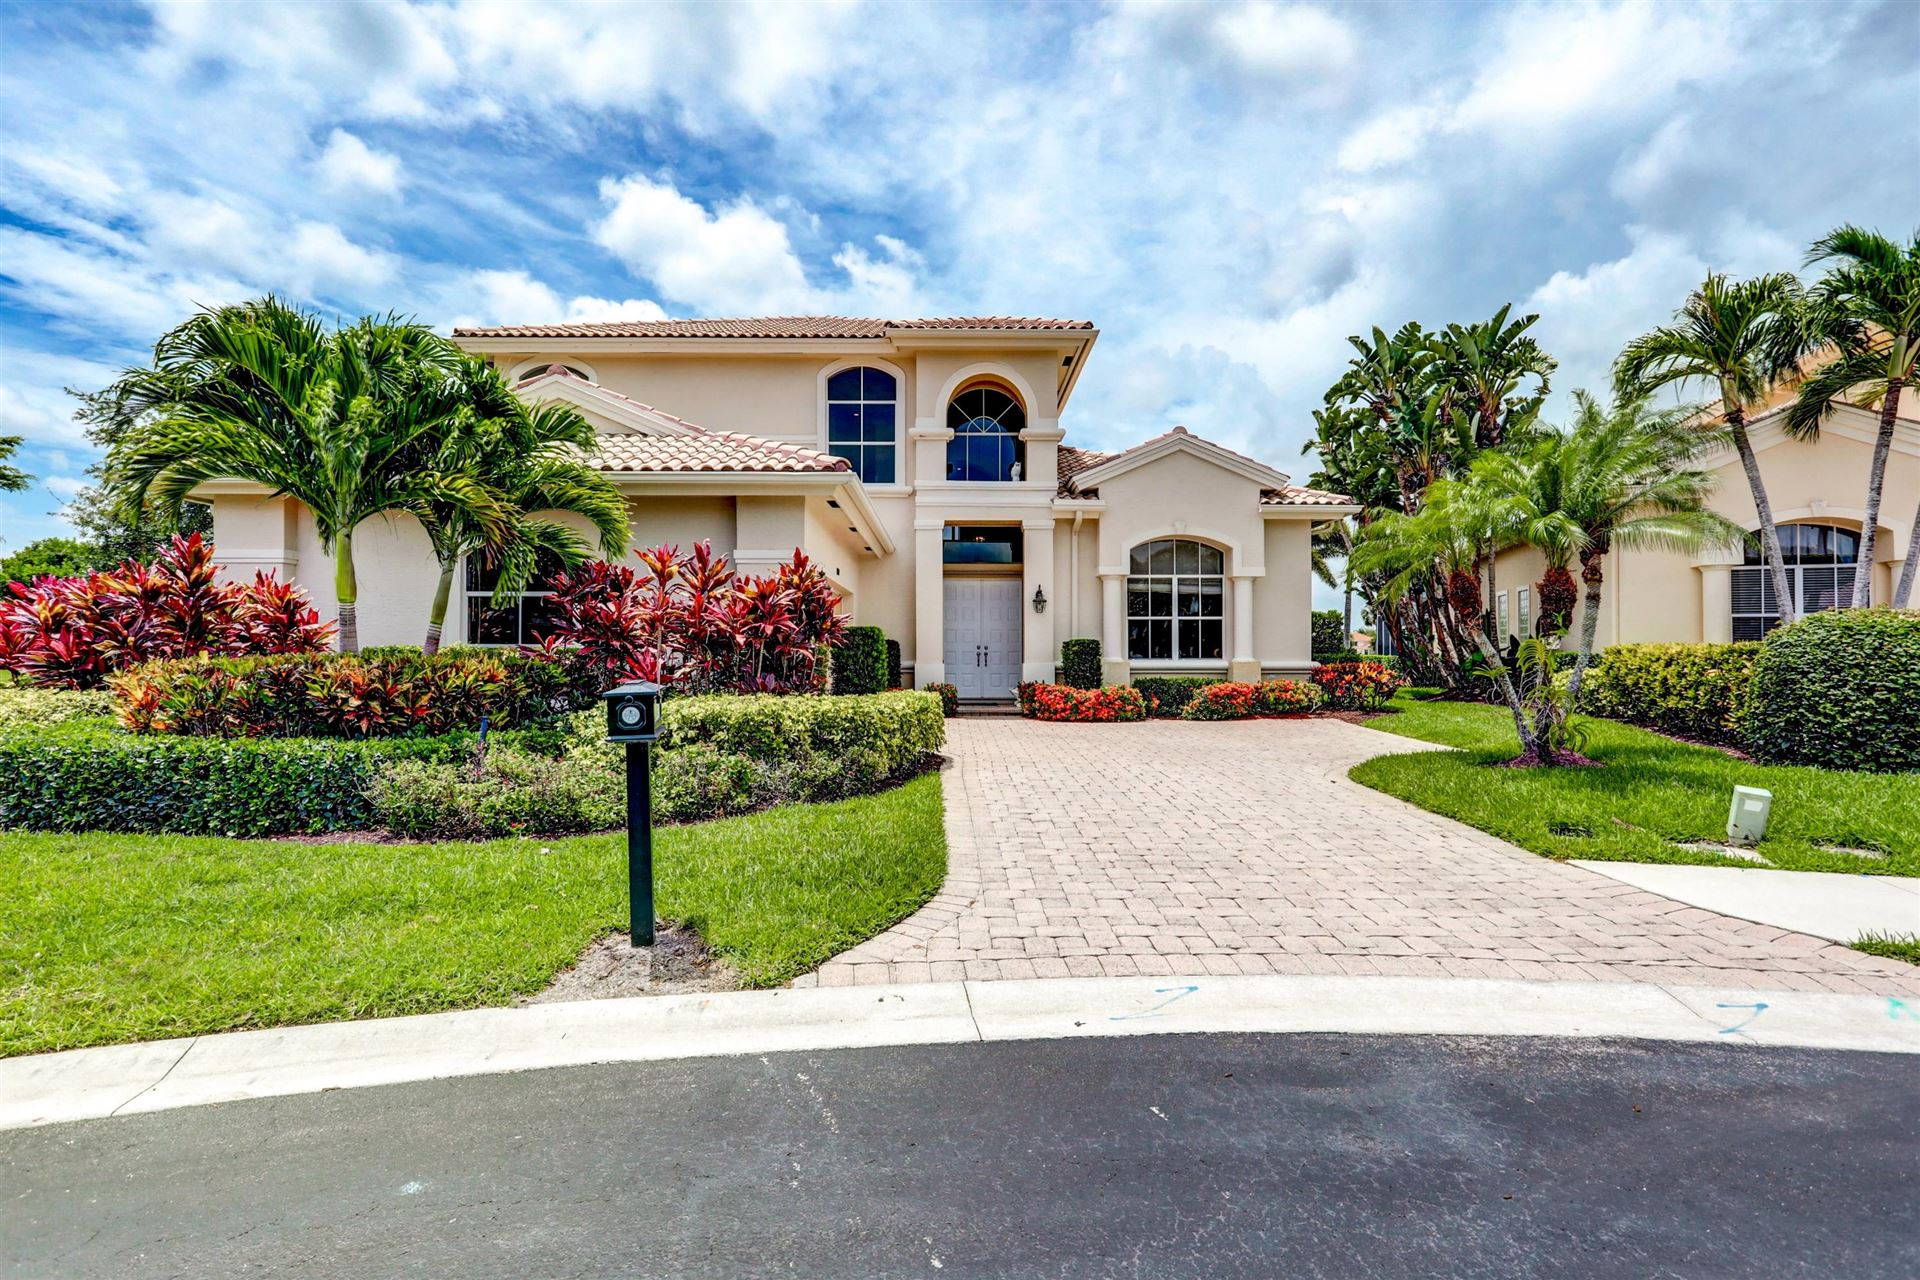 1124 Grand Cay Drive, Palm Beach Gardens, FL 33418 - MLS#: RX-10722991